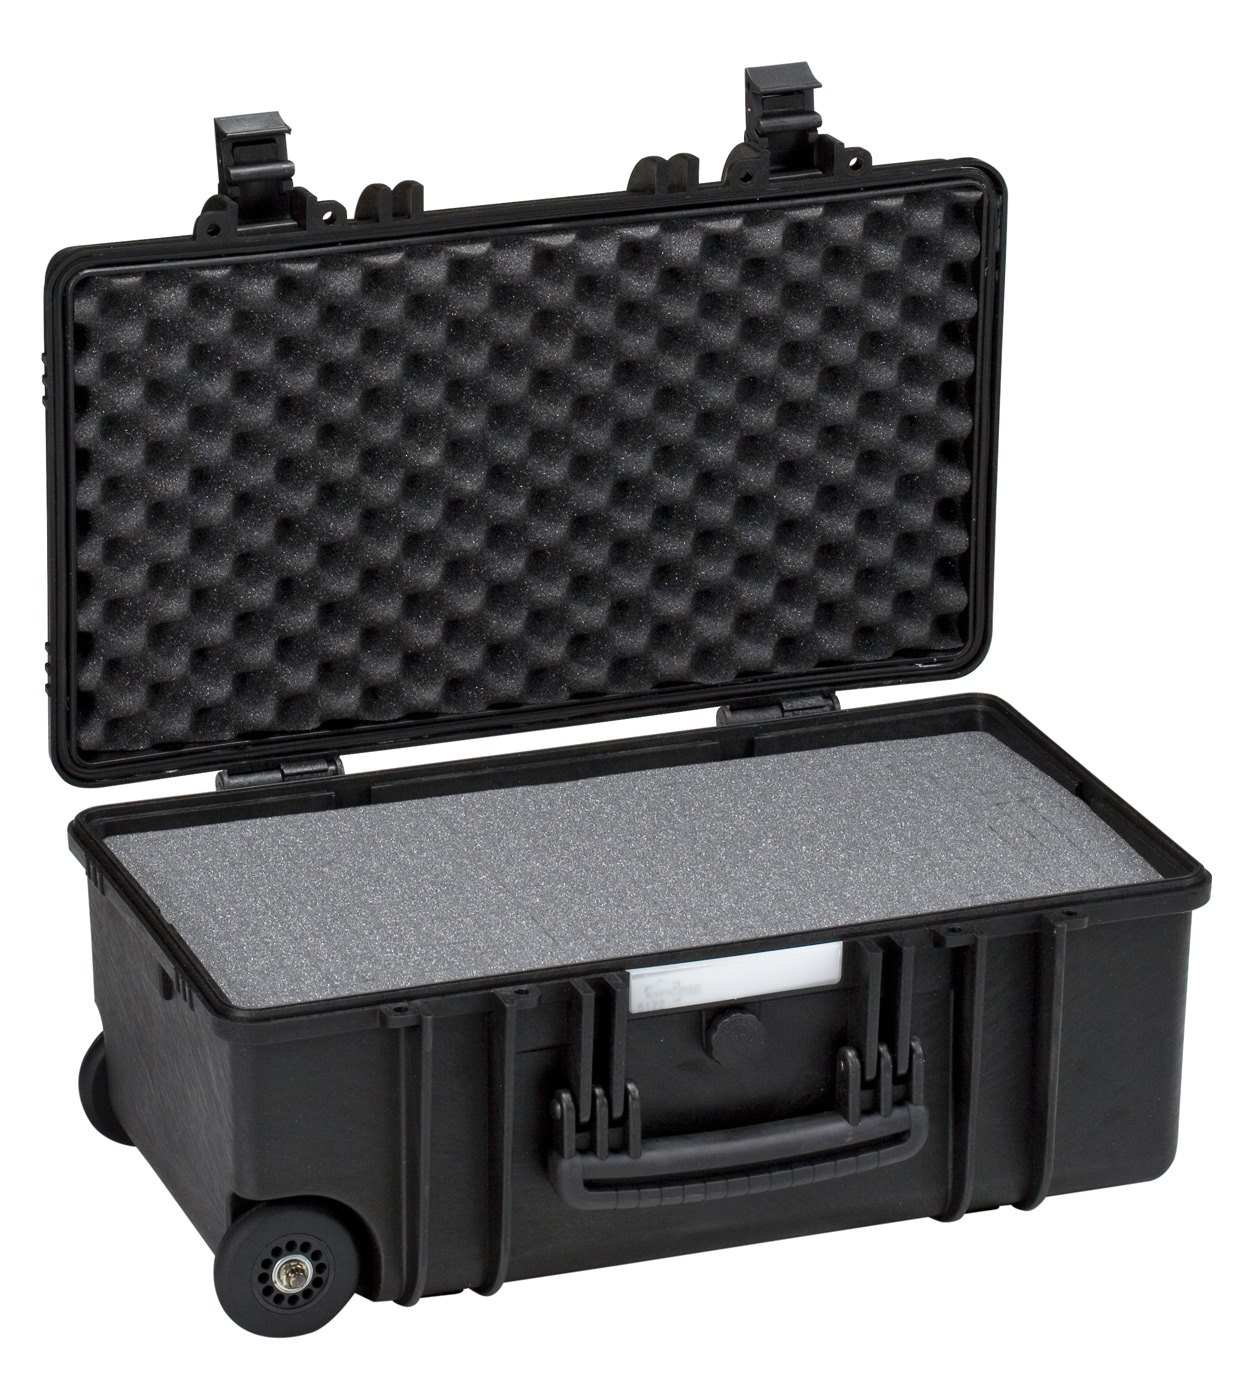 Military Green Explorer Cases 4820 GE Waterproof Dustproof Multi-Purpose Protective Case Empty